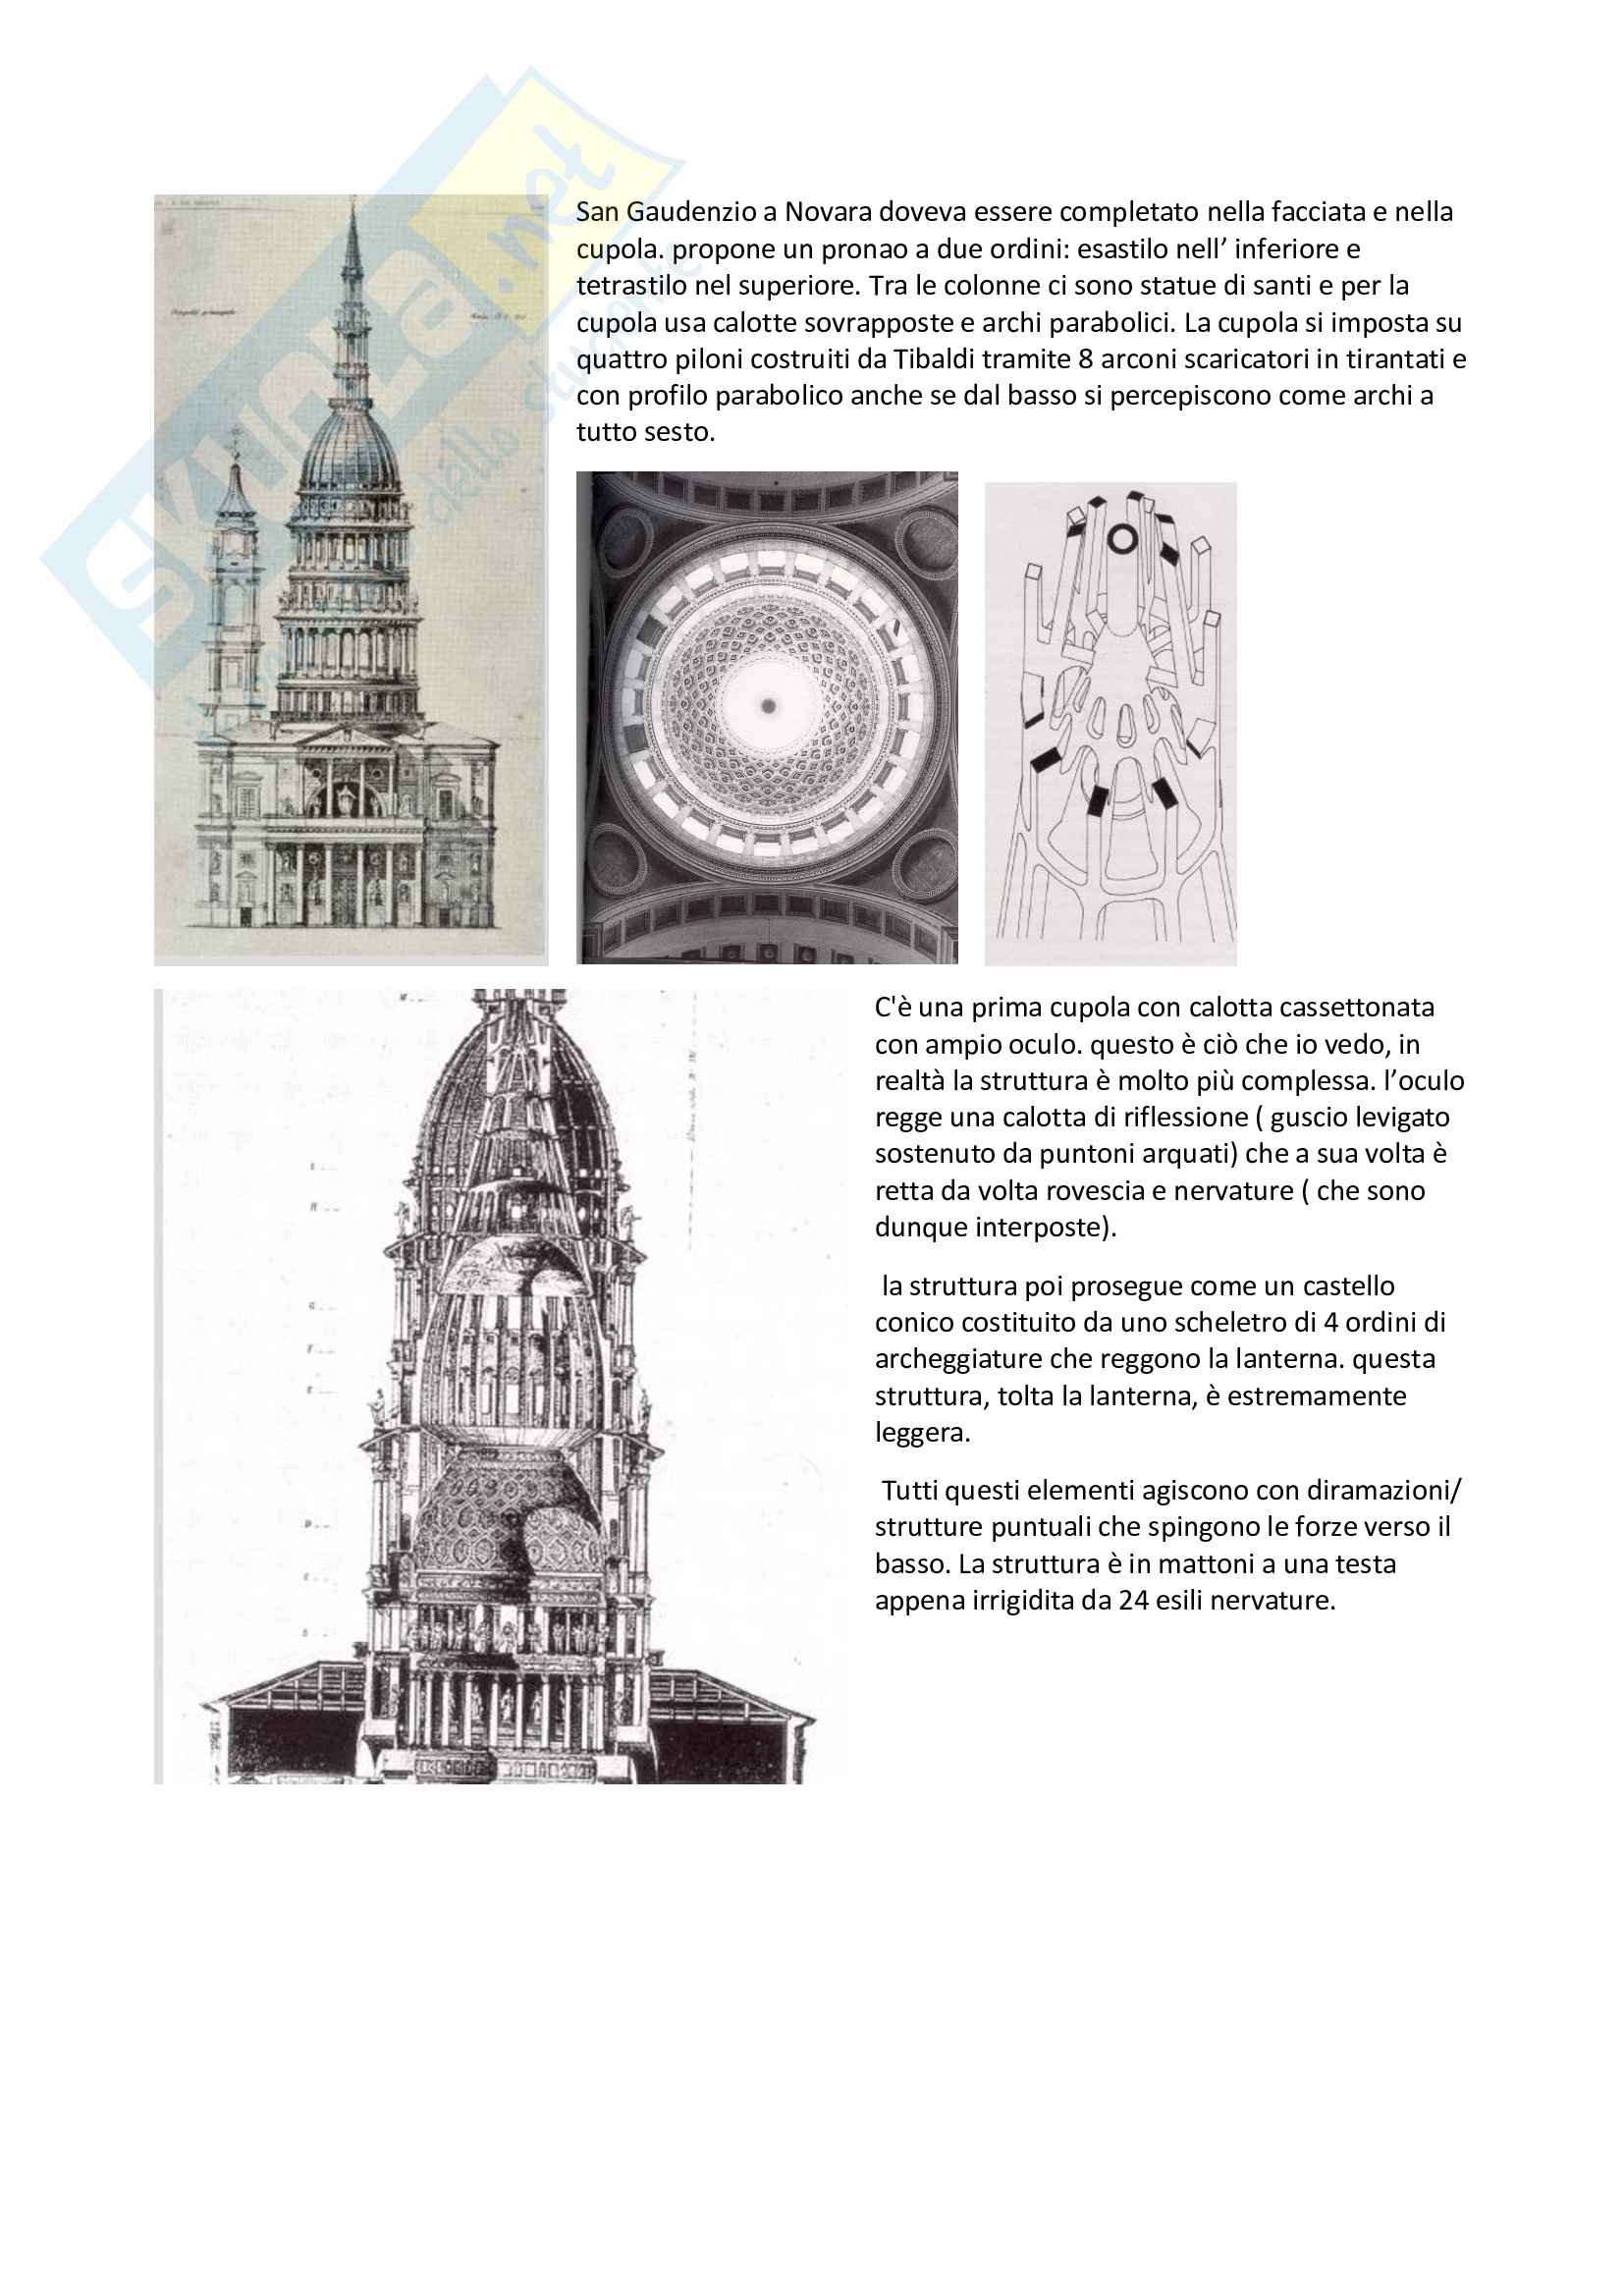 Storia dell'architettura 2, Iacobone, Lezioni Pag. 36